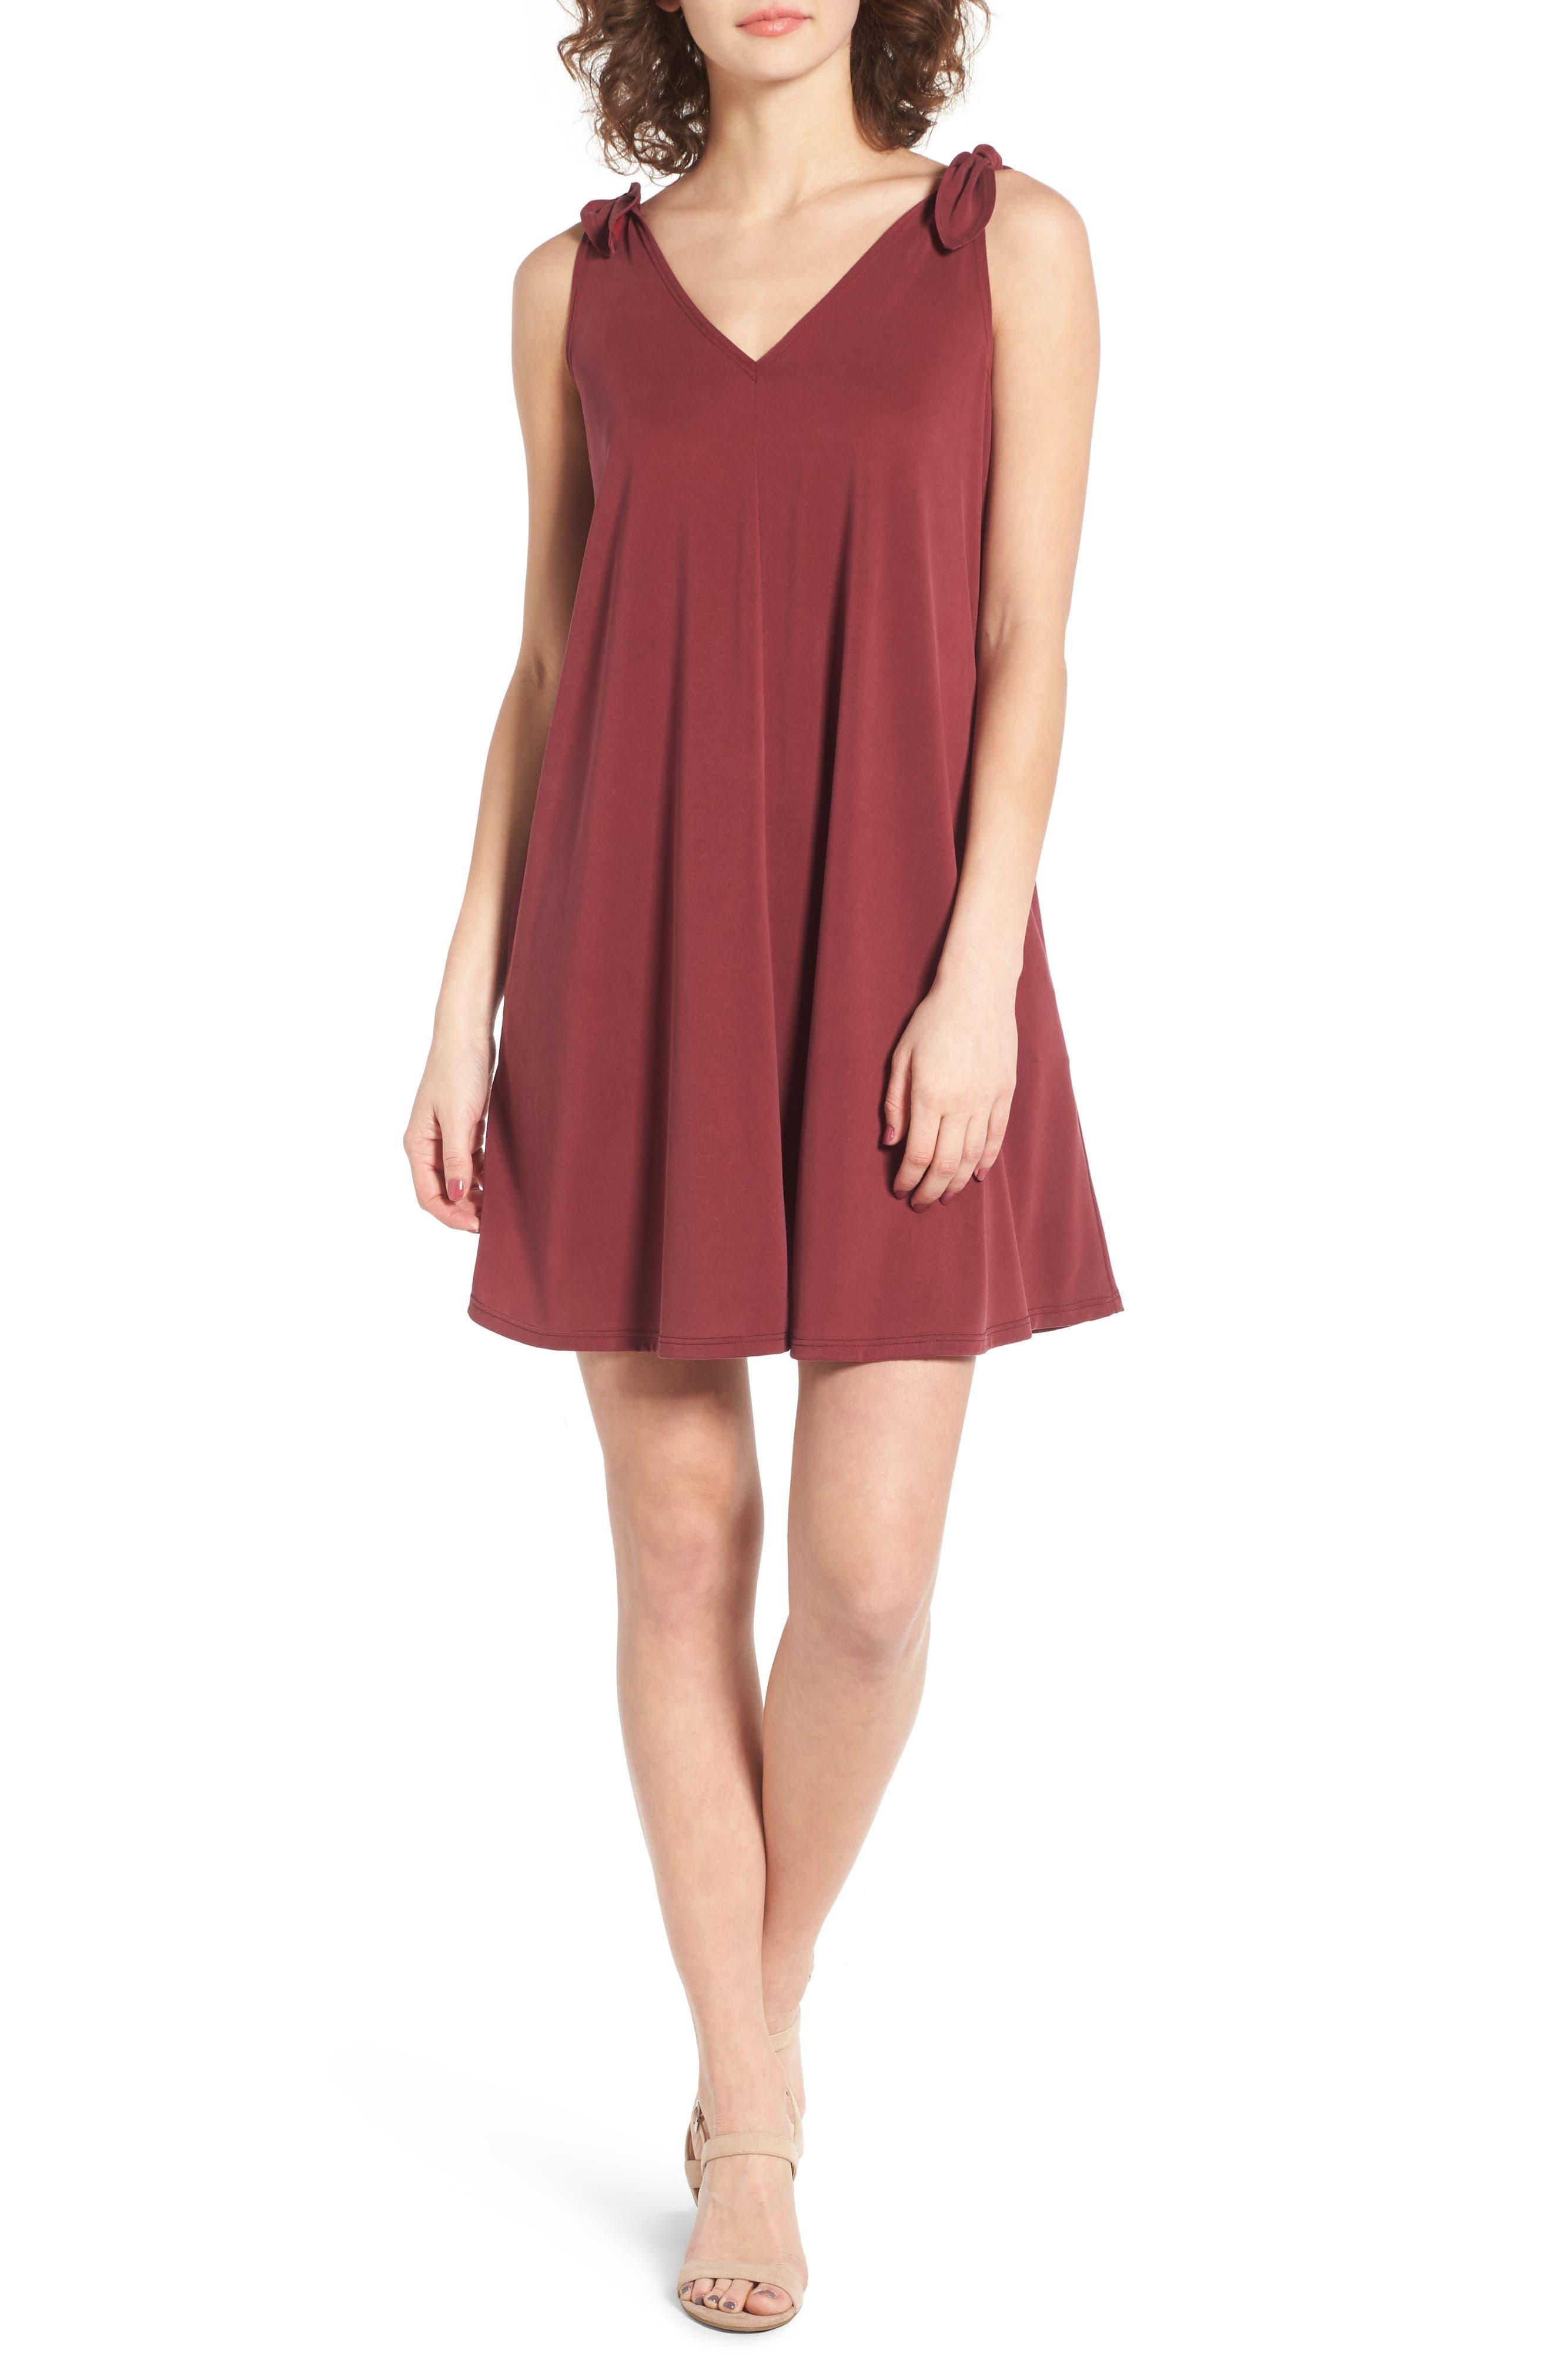 Alternate Image 1 Selected - Soprano Shoulder Tie Dress